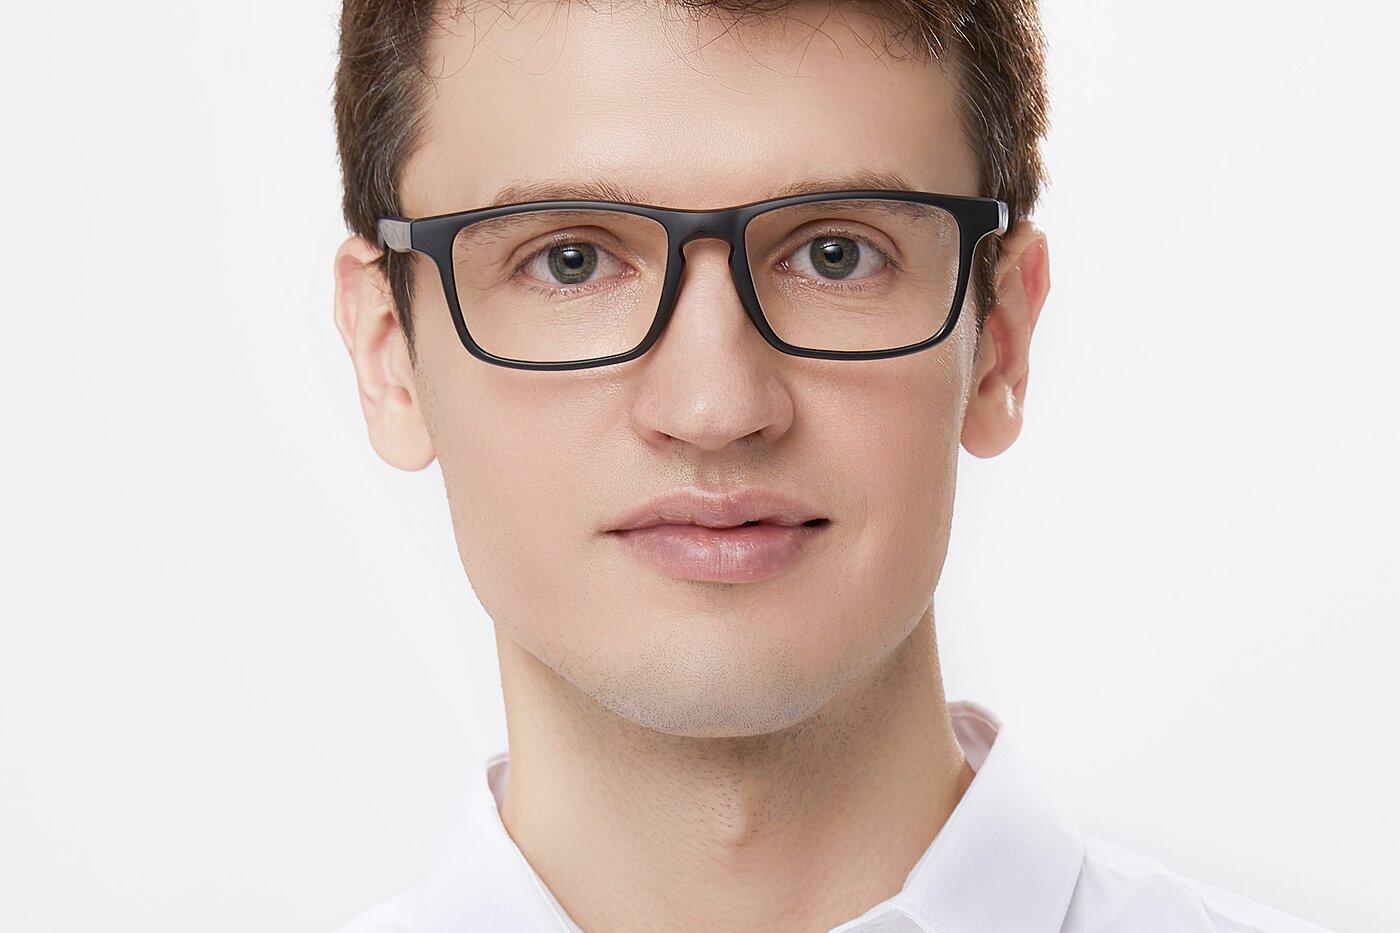 Matte Black-Gray Wrap Around Keyhole Bridge TR90 Eyeglasses